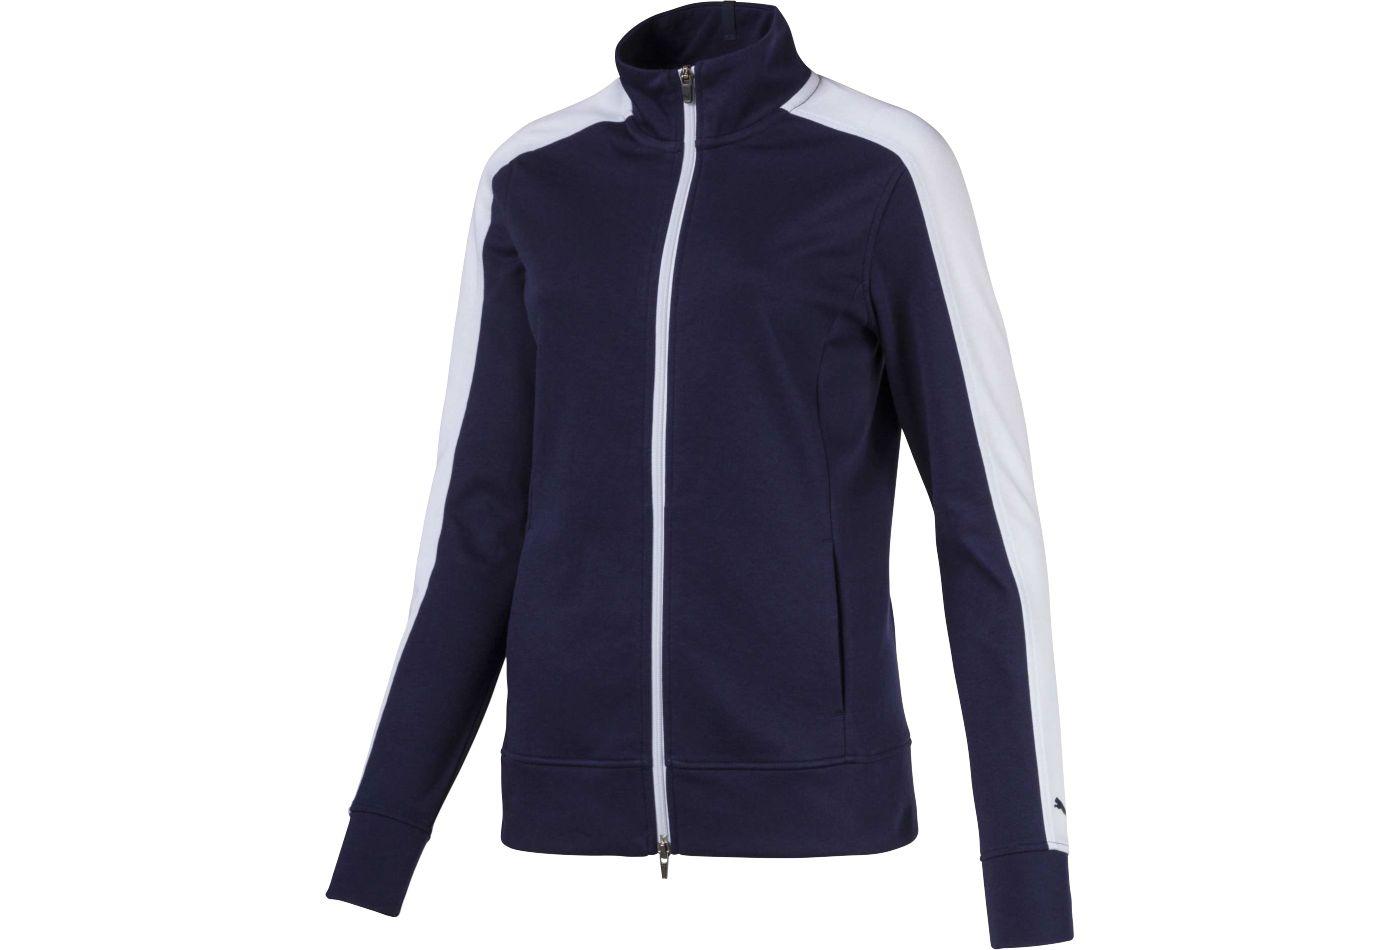 PUMA Women's Golf Track Jacket